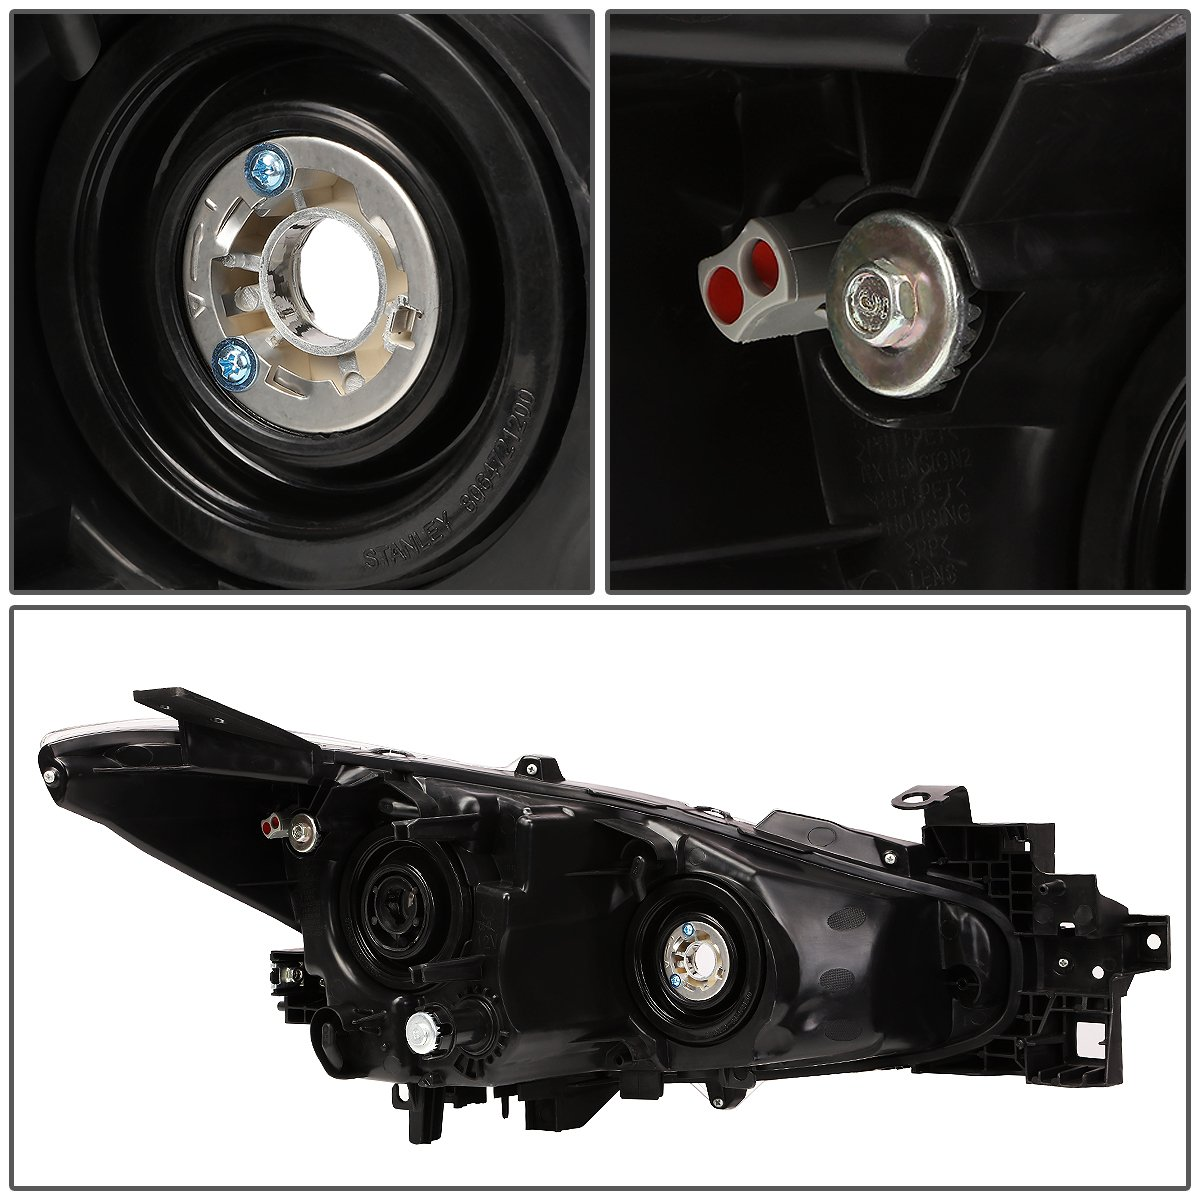 Driver /& Passenger Side DNA Motoring HL-OH-MM314-SM-CL1 Projector Headlight